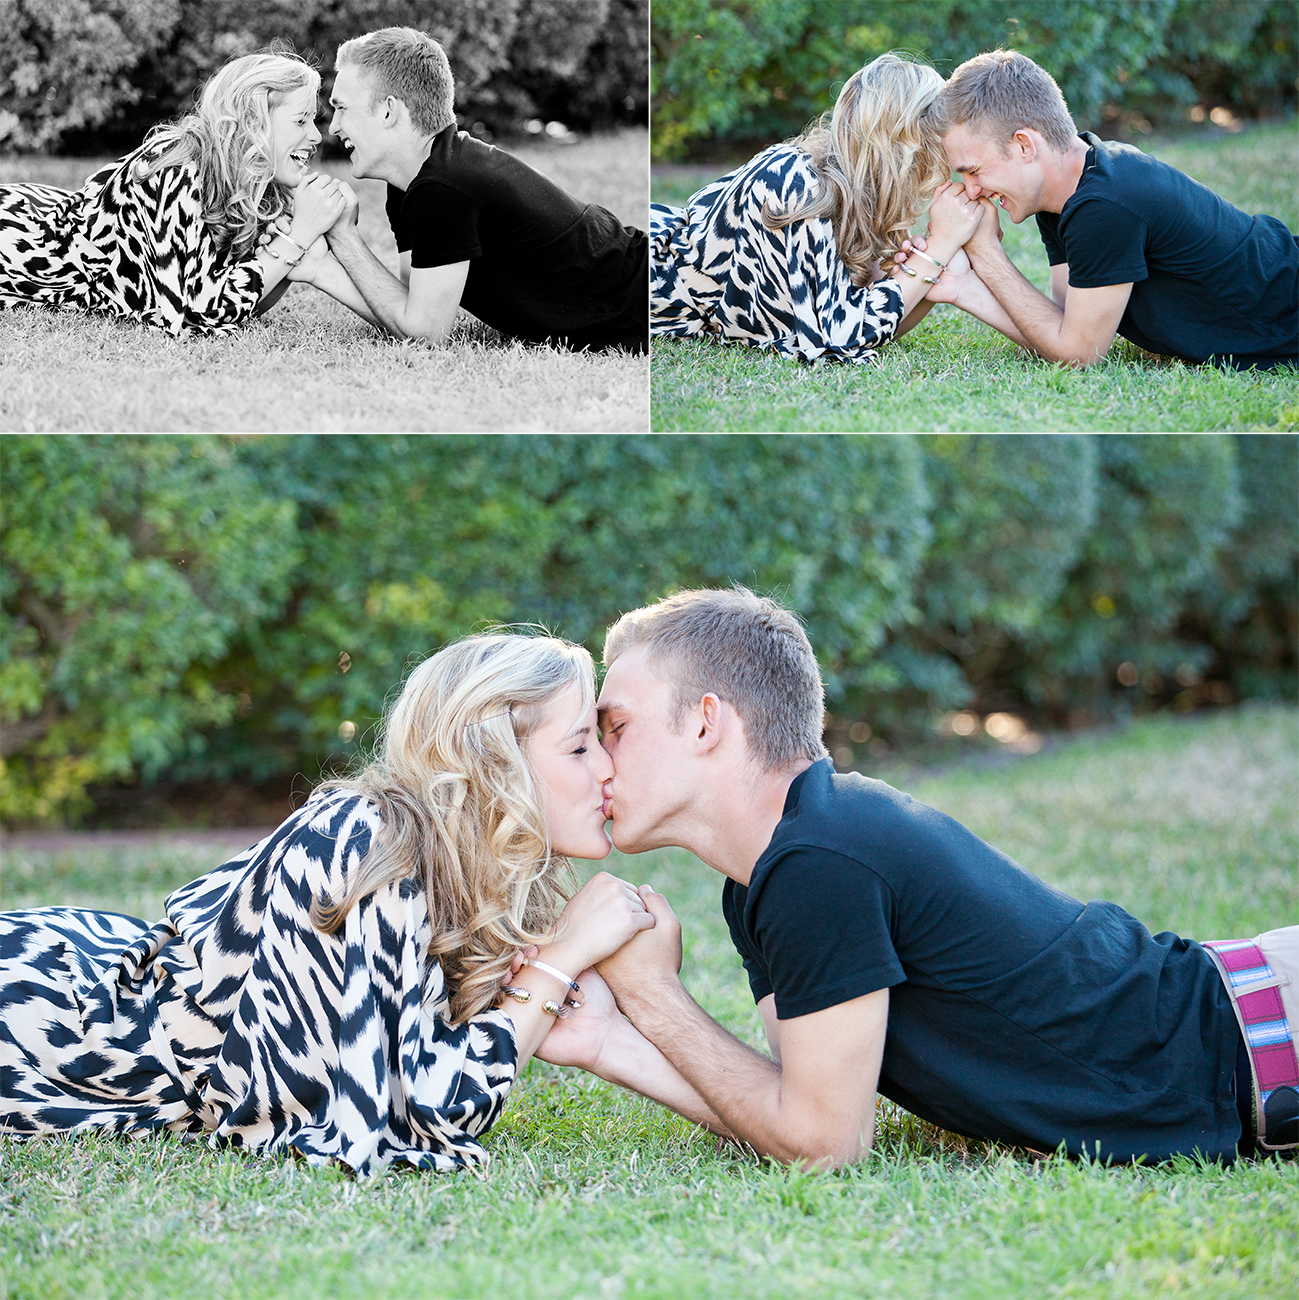 San Antonio Photographer: San Antonio Photographers / San Antonio Couples